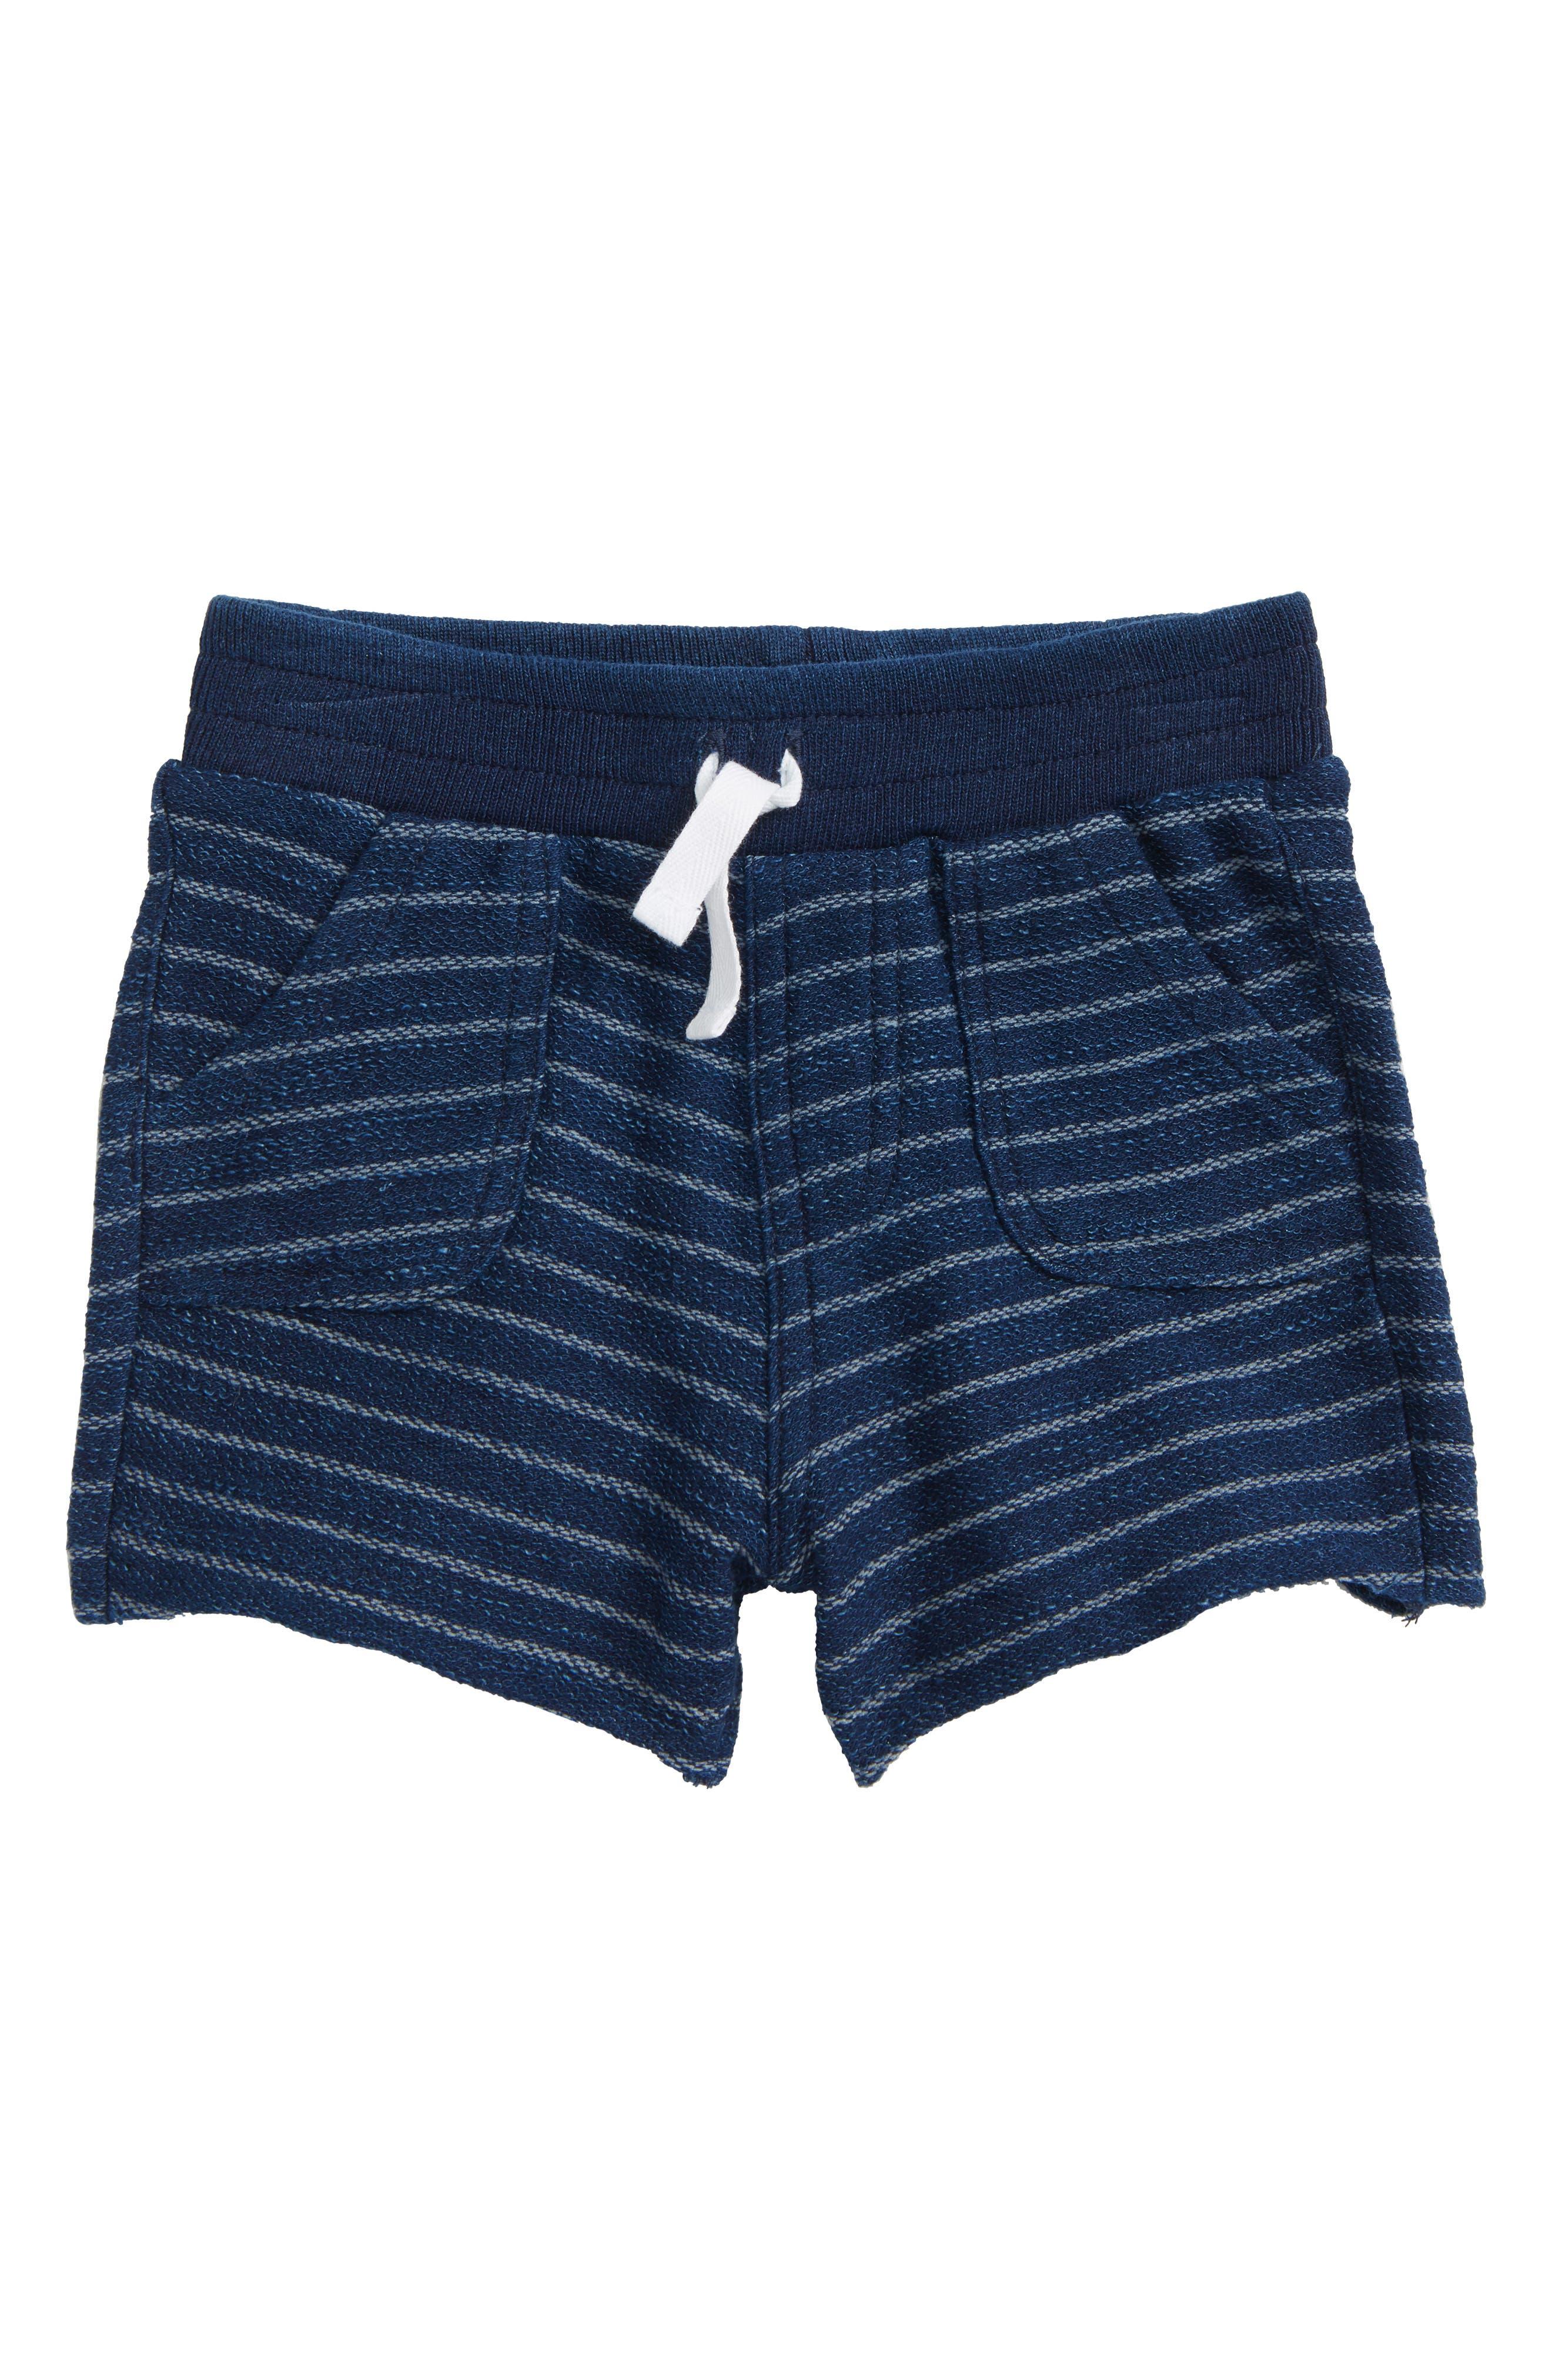 Indigo Stripe French Terry Shorts,                             Main thumbnail 1, color,                             Dark Stone/ Indigo